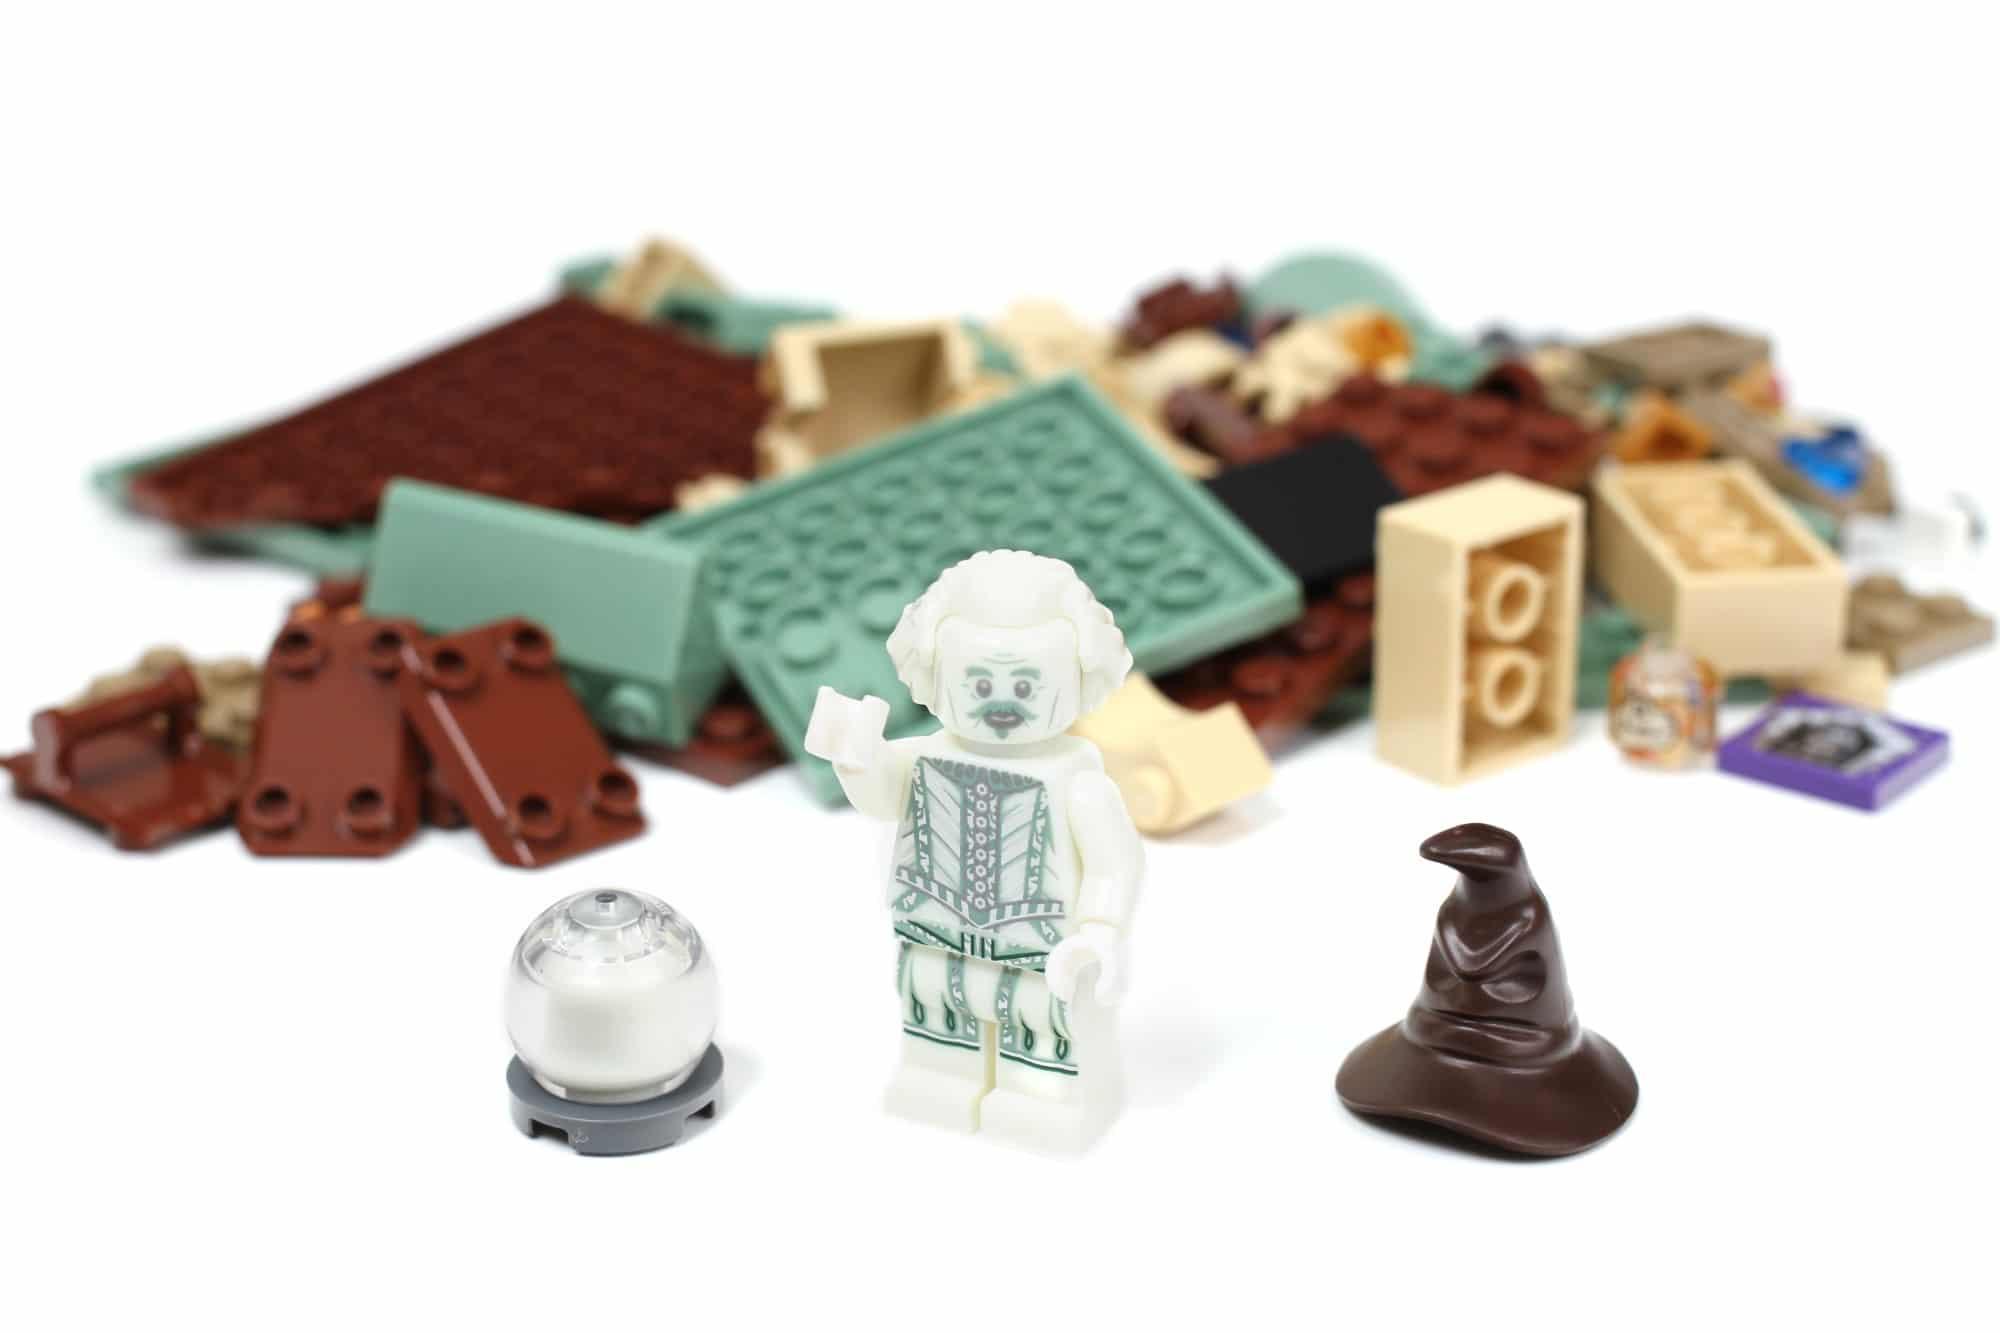 LEGO Harry Potter 76389 Hogwarts Kammer Des Schreckens Schritt 5 1